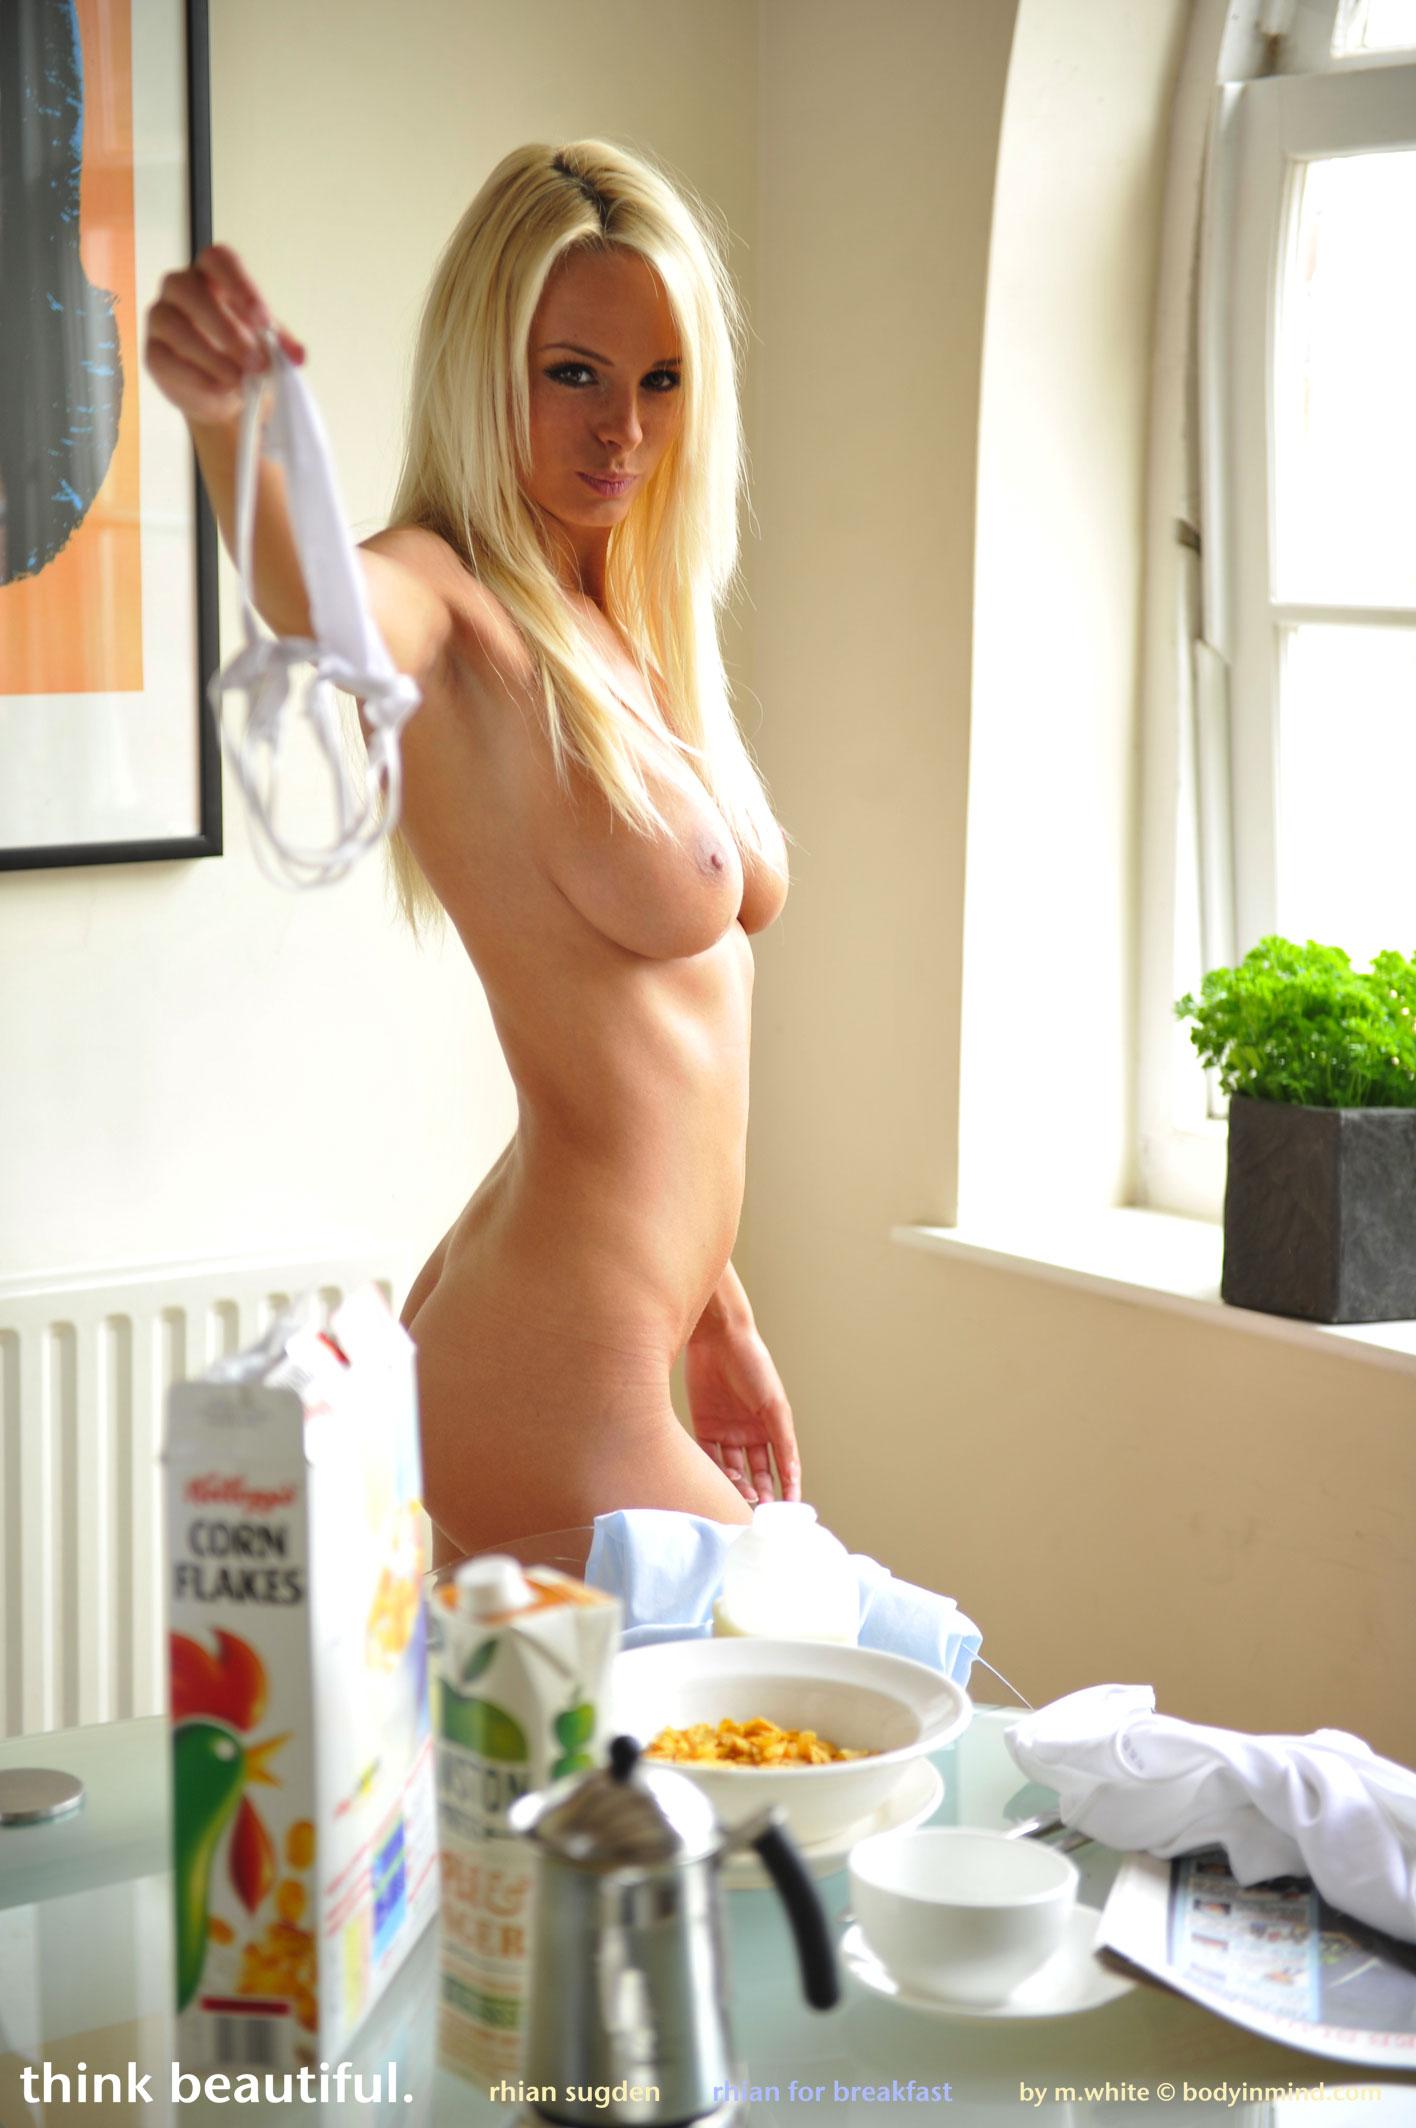 Rhian Sugden in Breakfast - NudesPuri.com